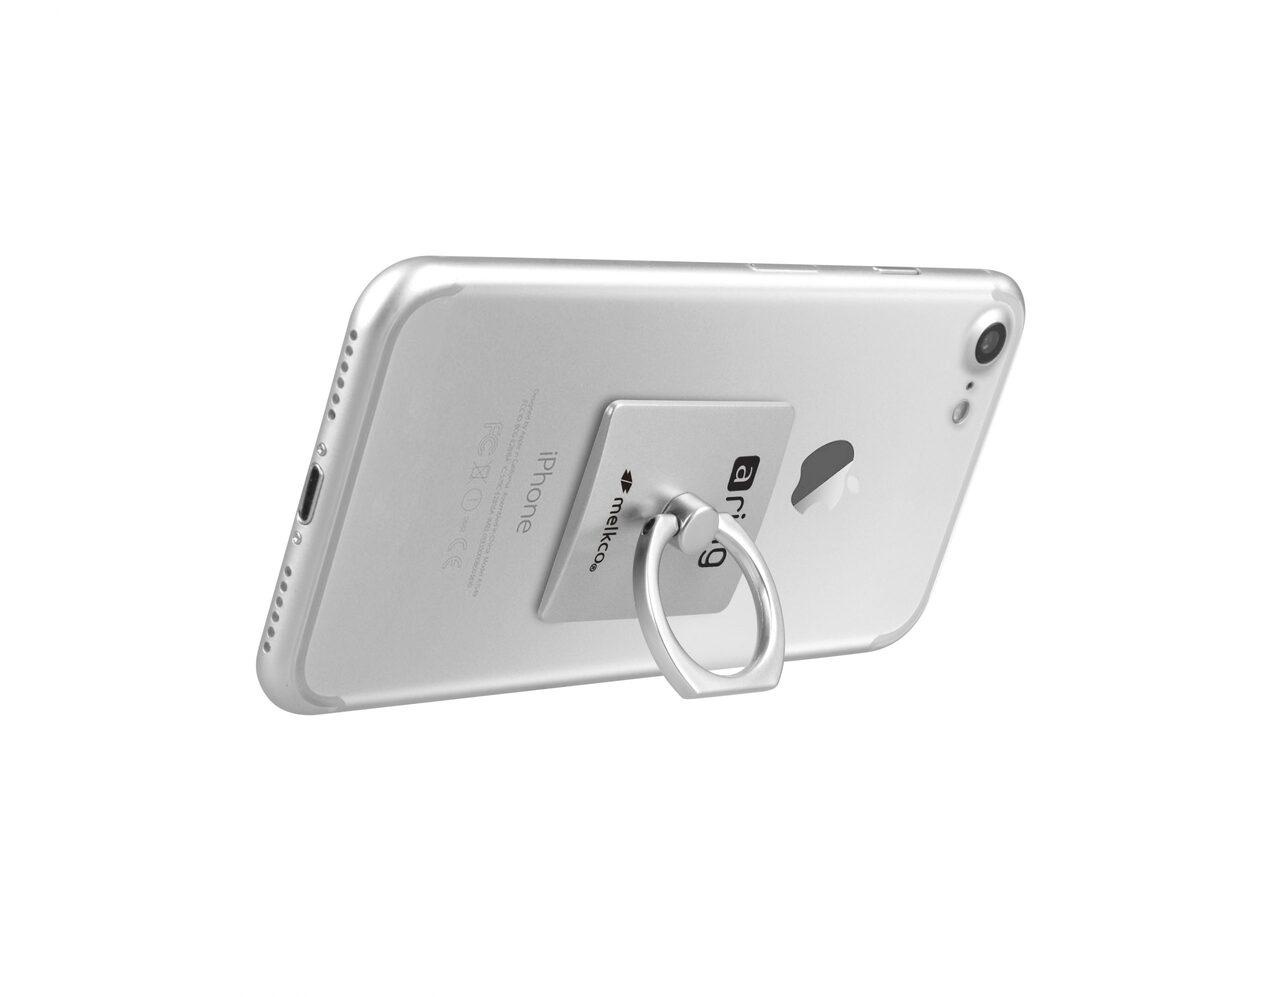 Melkco aring Universal Grip (Stand Smartphone Holder) - (Silver)